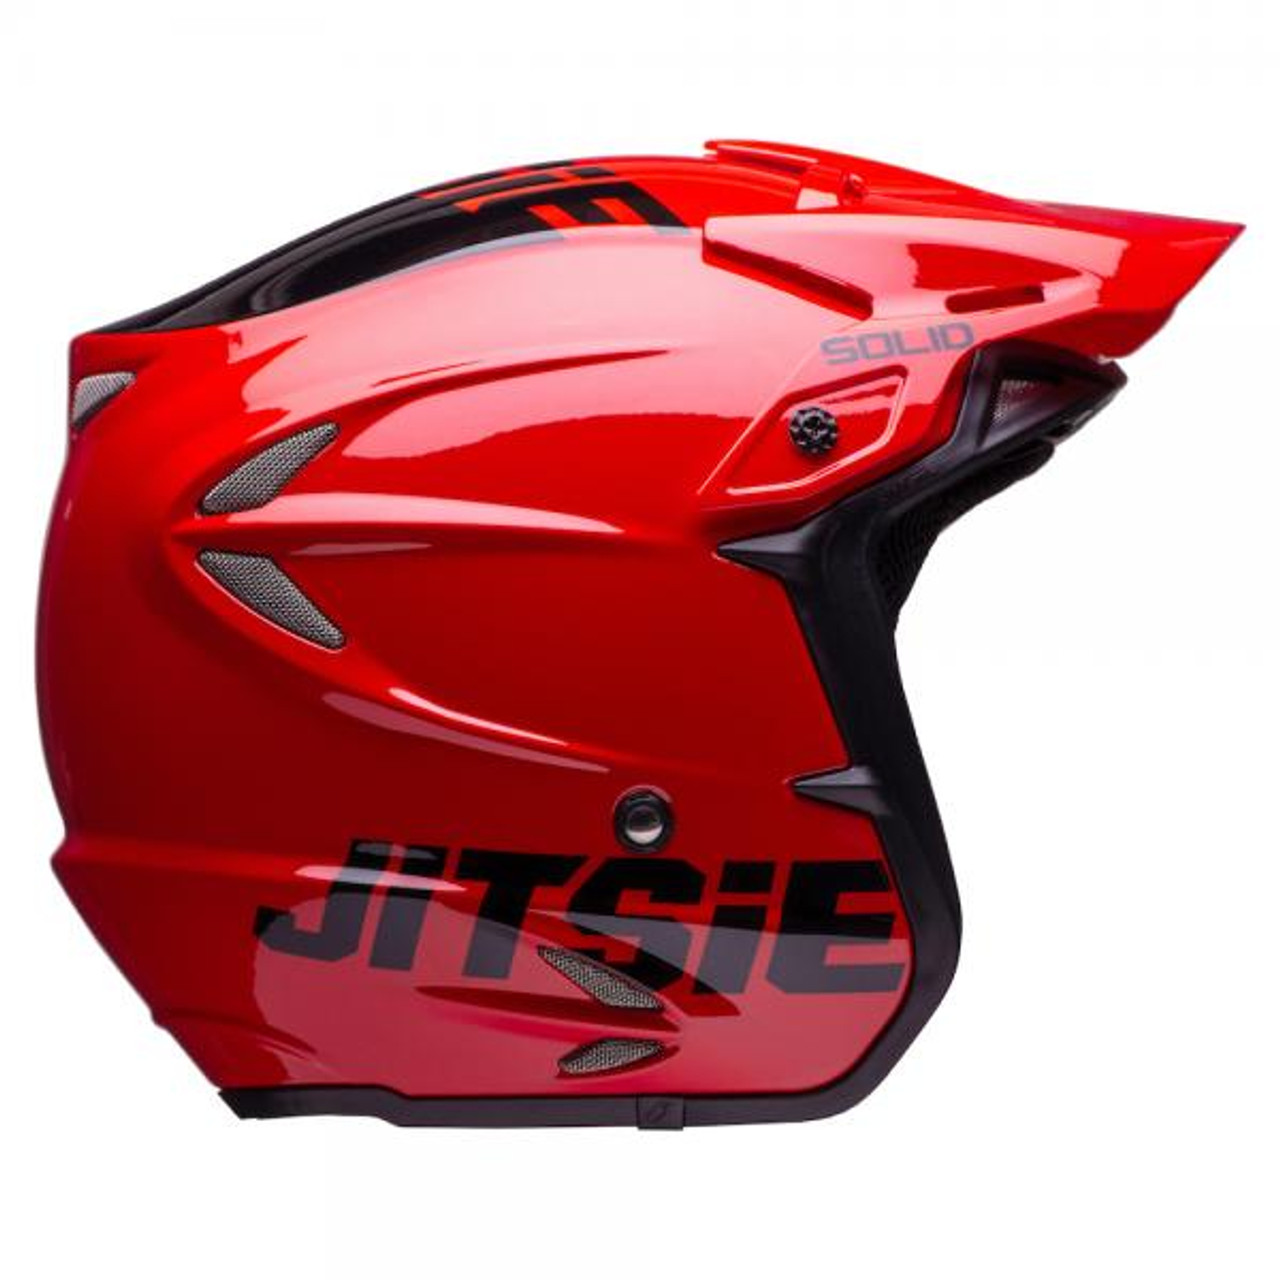 HT2 Solid helmet by Jitsie, red/ black, fiberglass